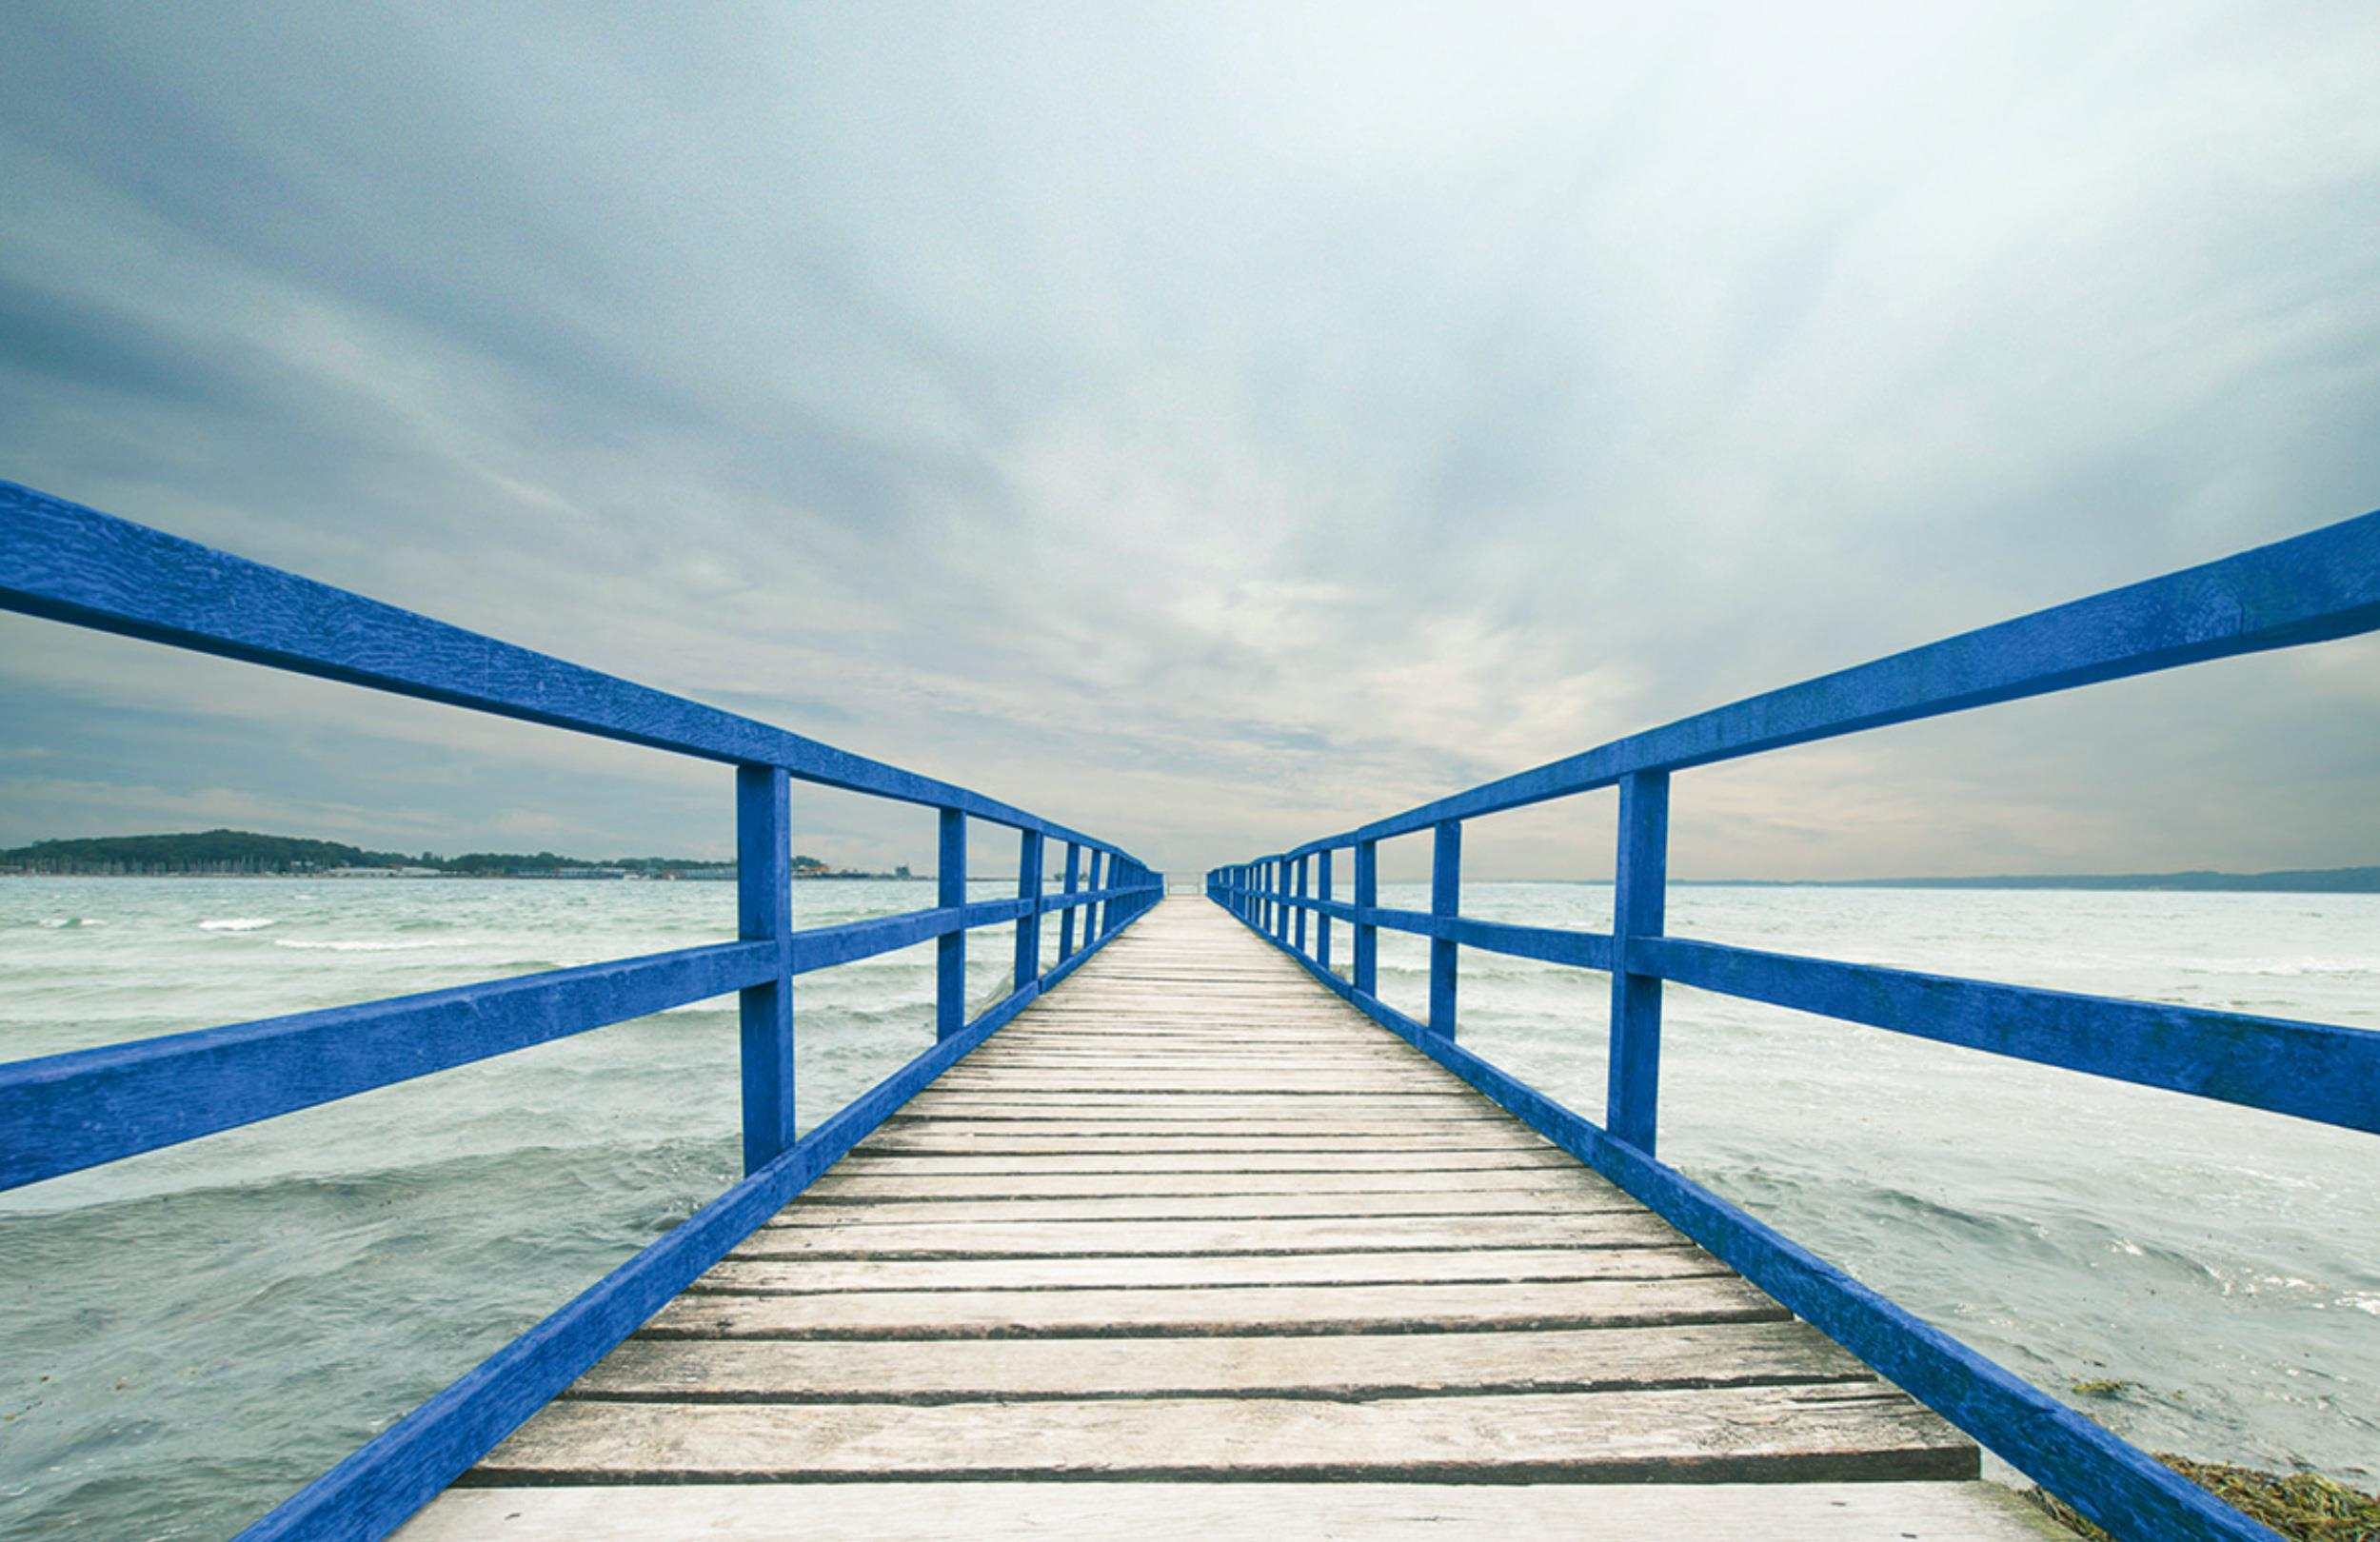 Bridge with blue railings